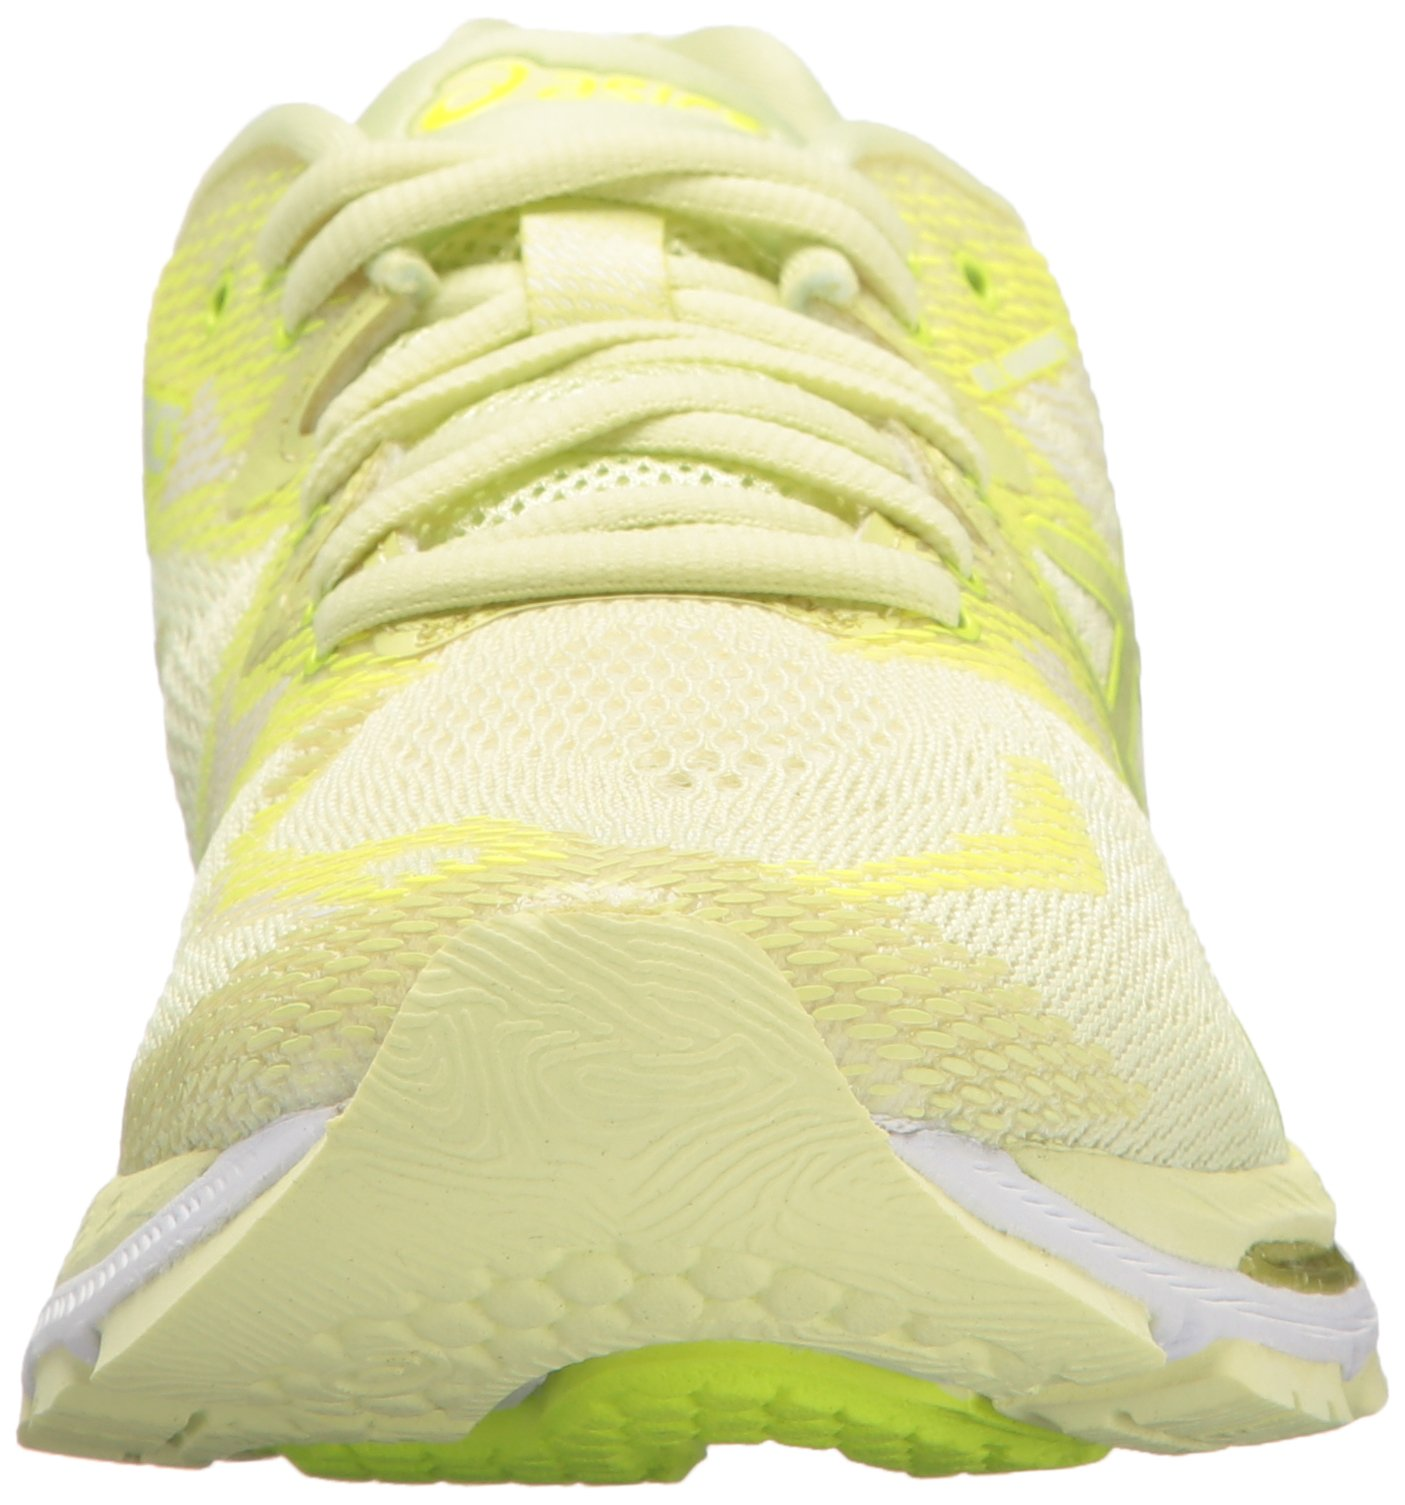 ASICS Women's Gel-Nimbus 20 Running Shoe, limelight/limelight/safety yellow, 5.5 Medium US by ASICS (Image #4)